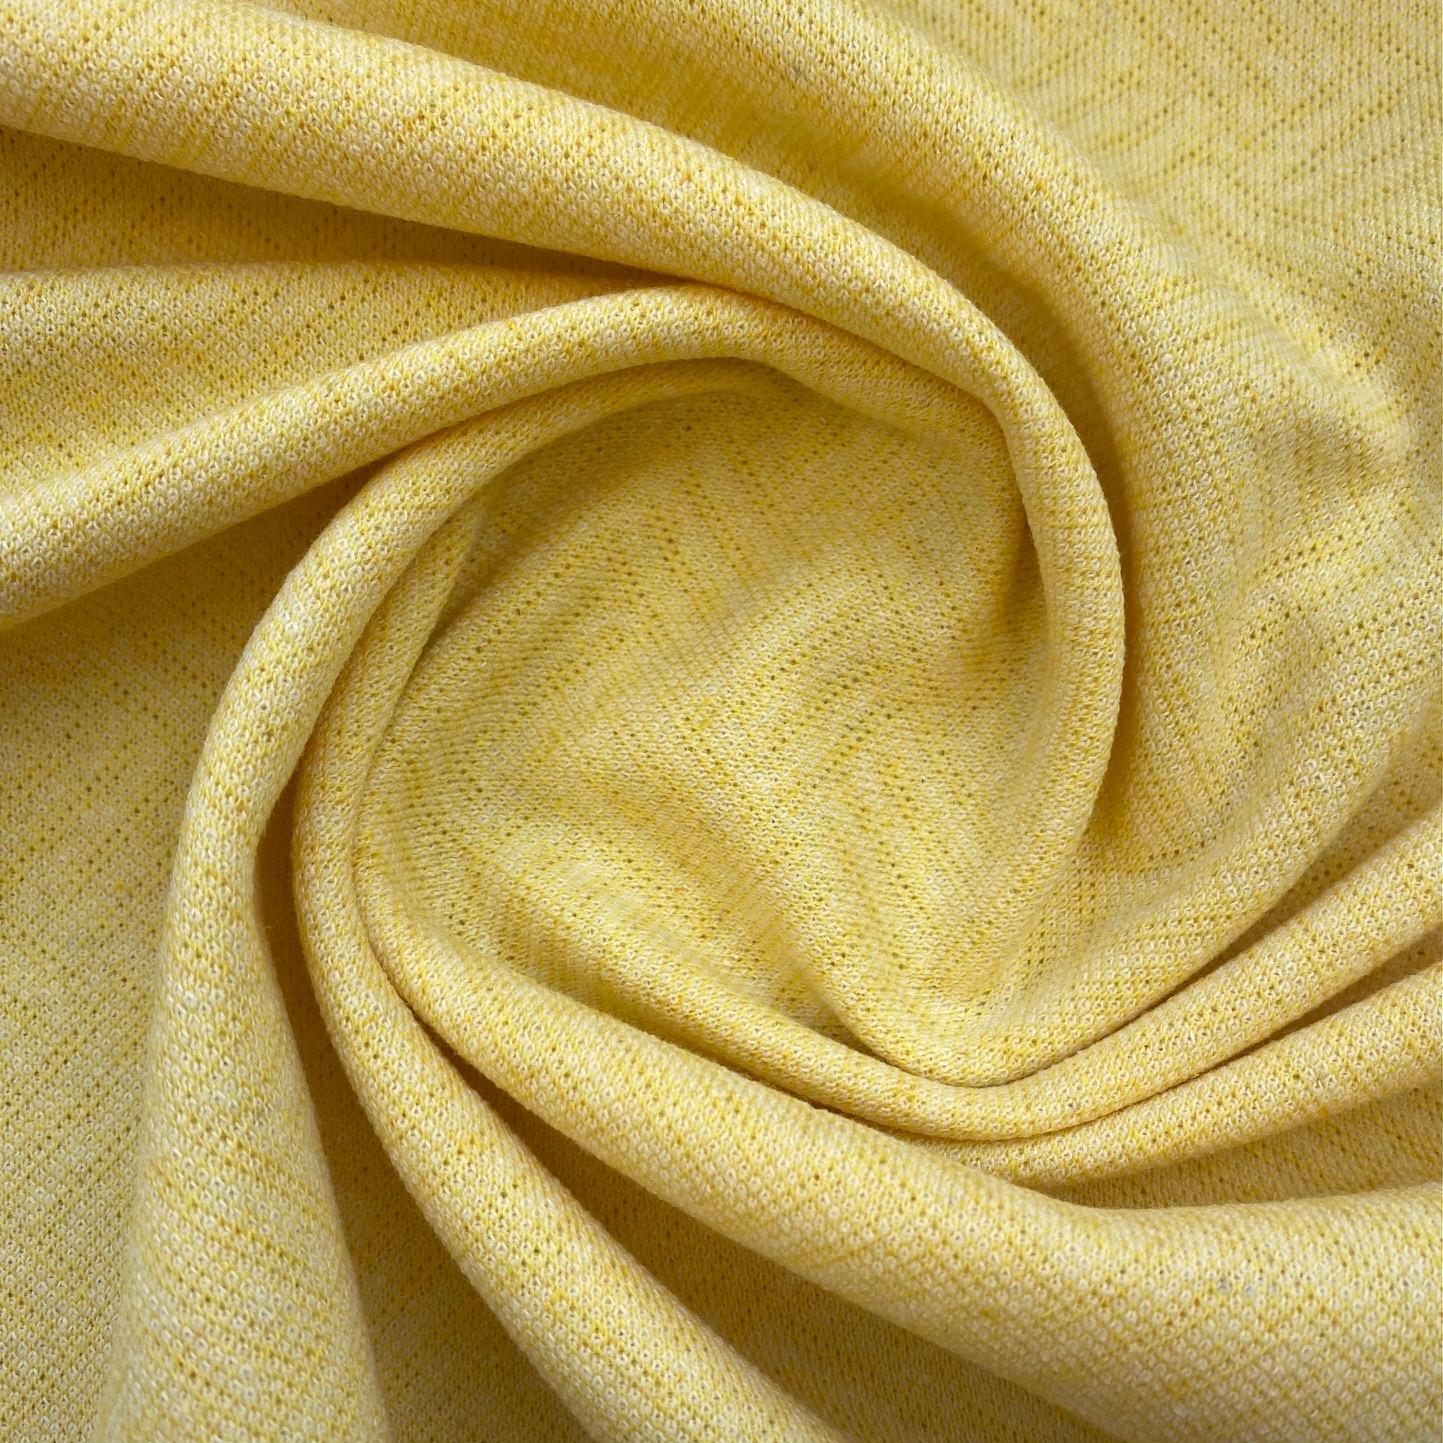 Strick Jacquard aus recycelter Baumwolle, gelb. Art. 319016.41